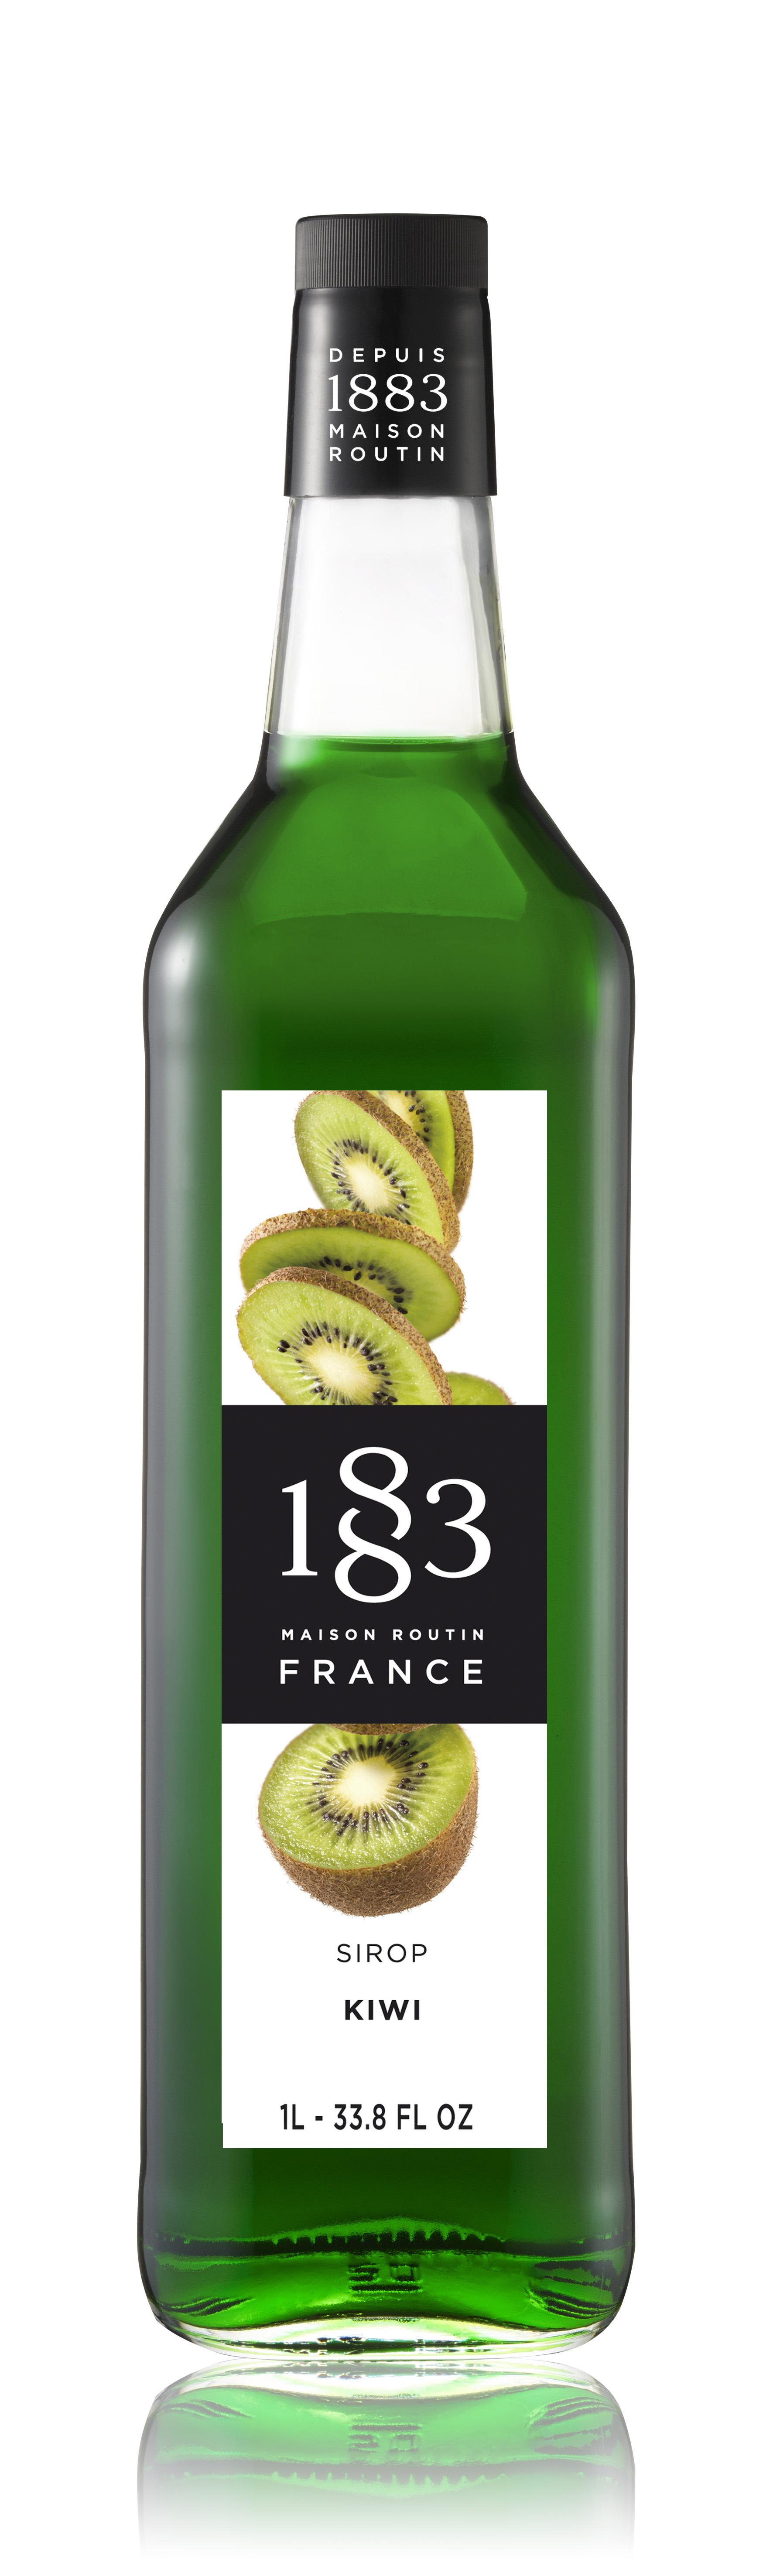 1883 Syrup Kiwi 1L Glass Bottle